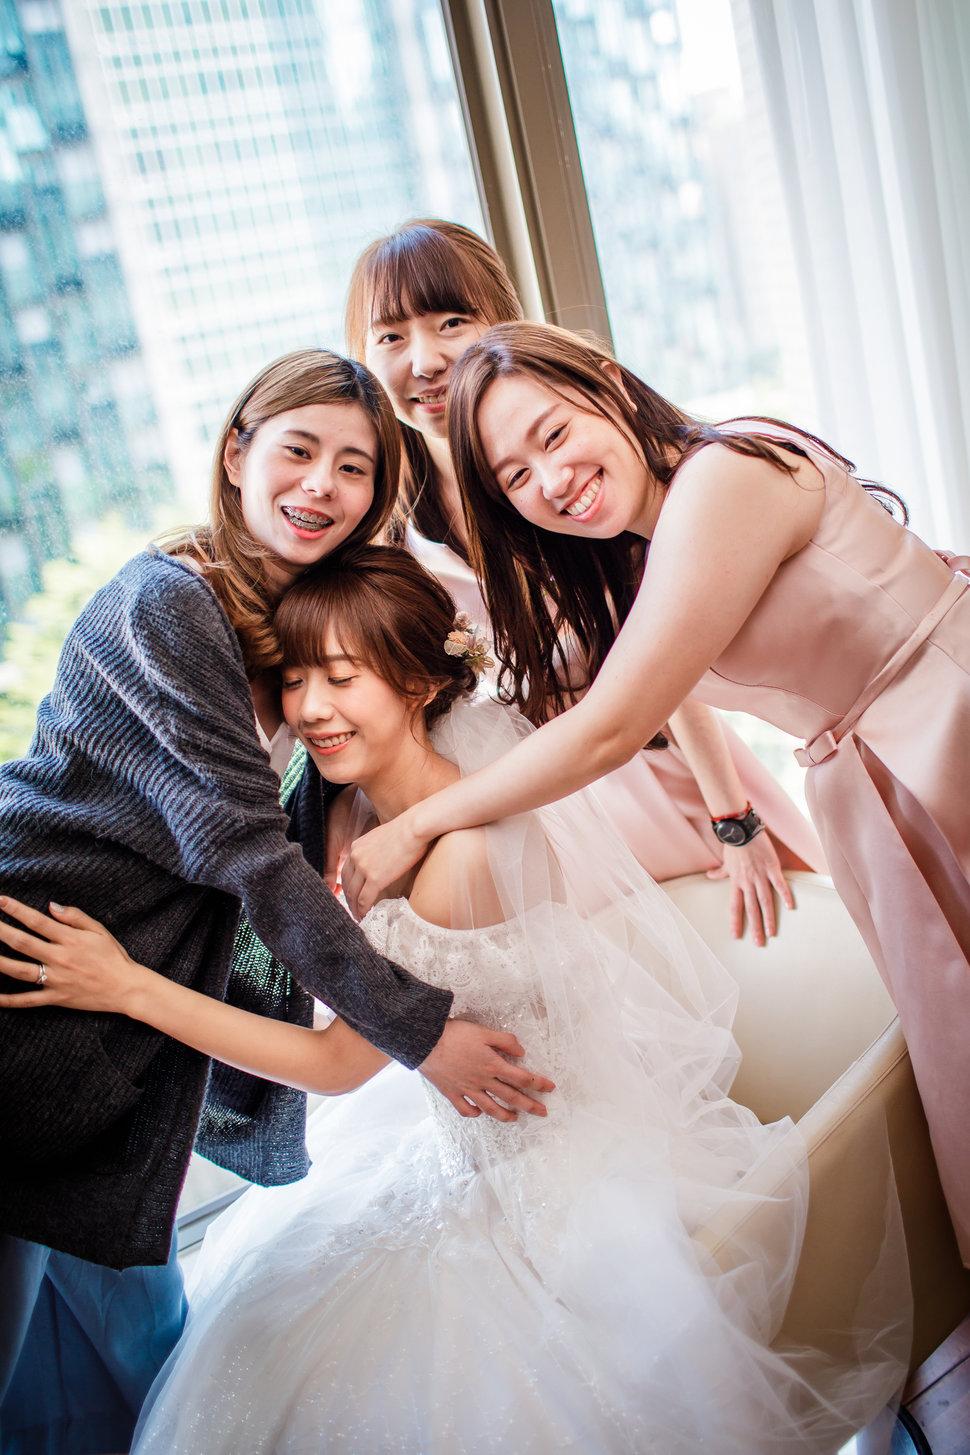 wedding-250 - J-Love 婚禮攝影團隊《結婚吧》